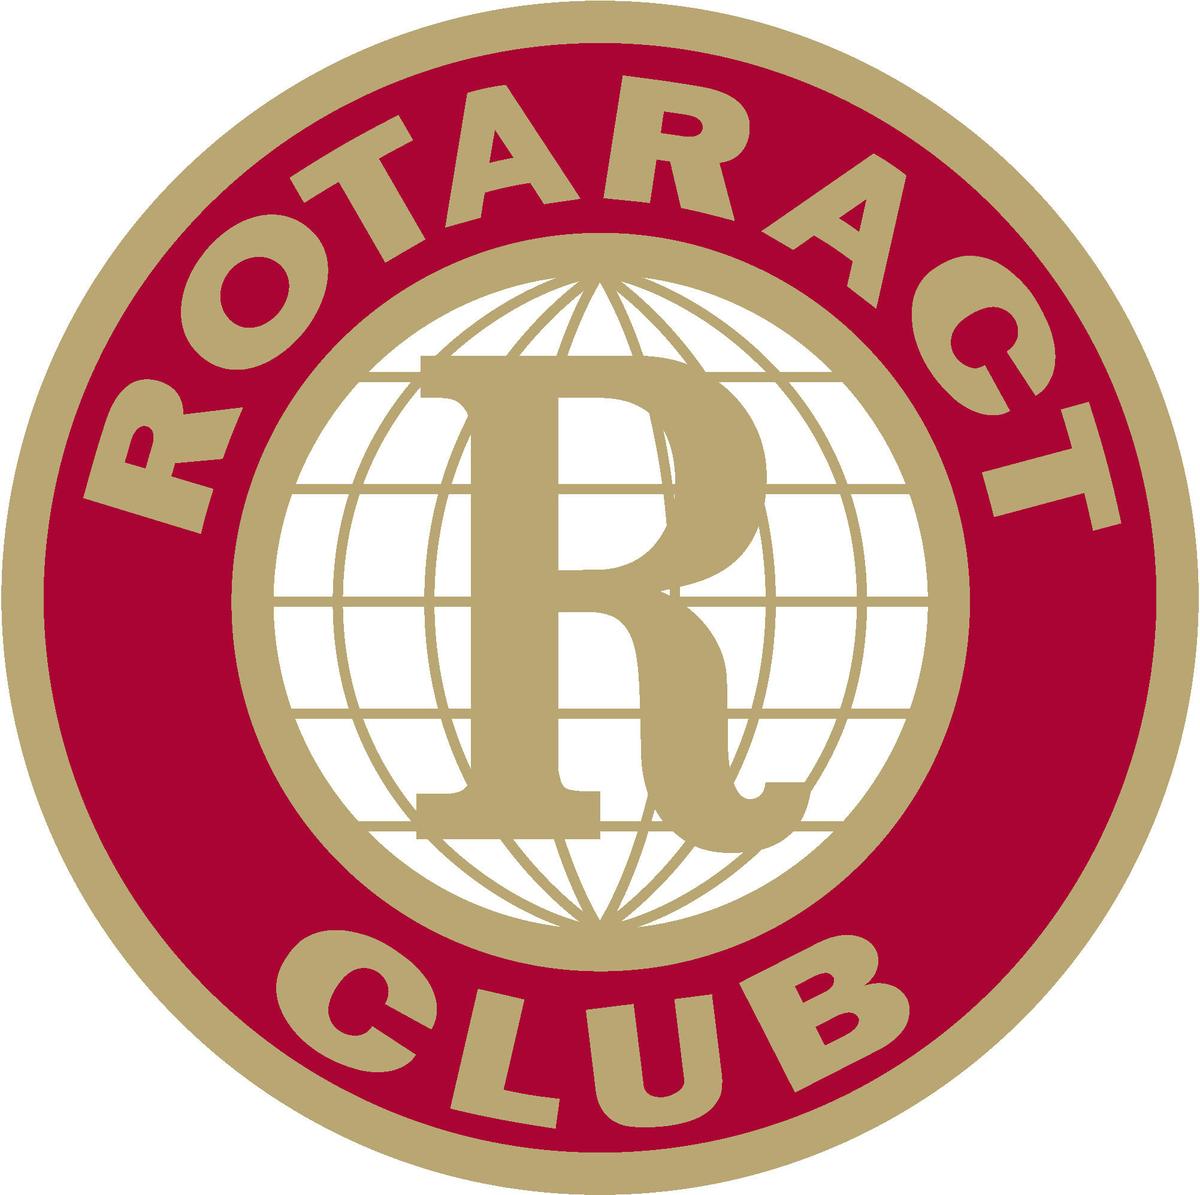 Rotary Club Of Tucson Car Show